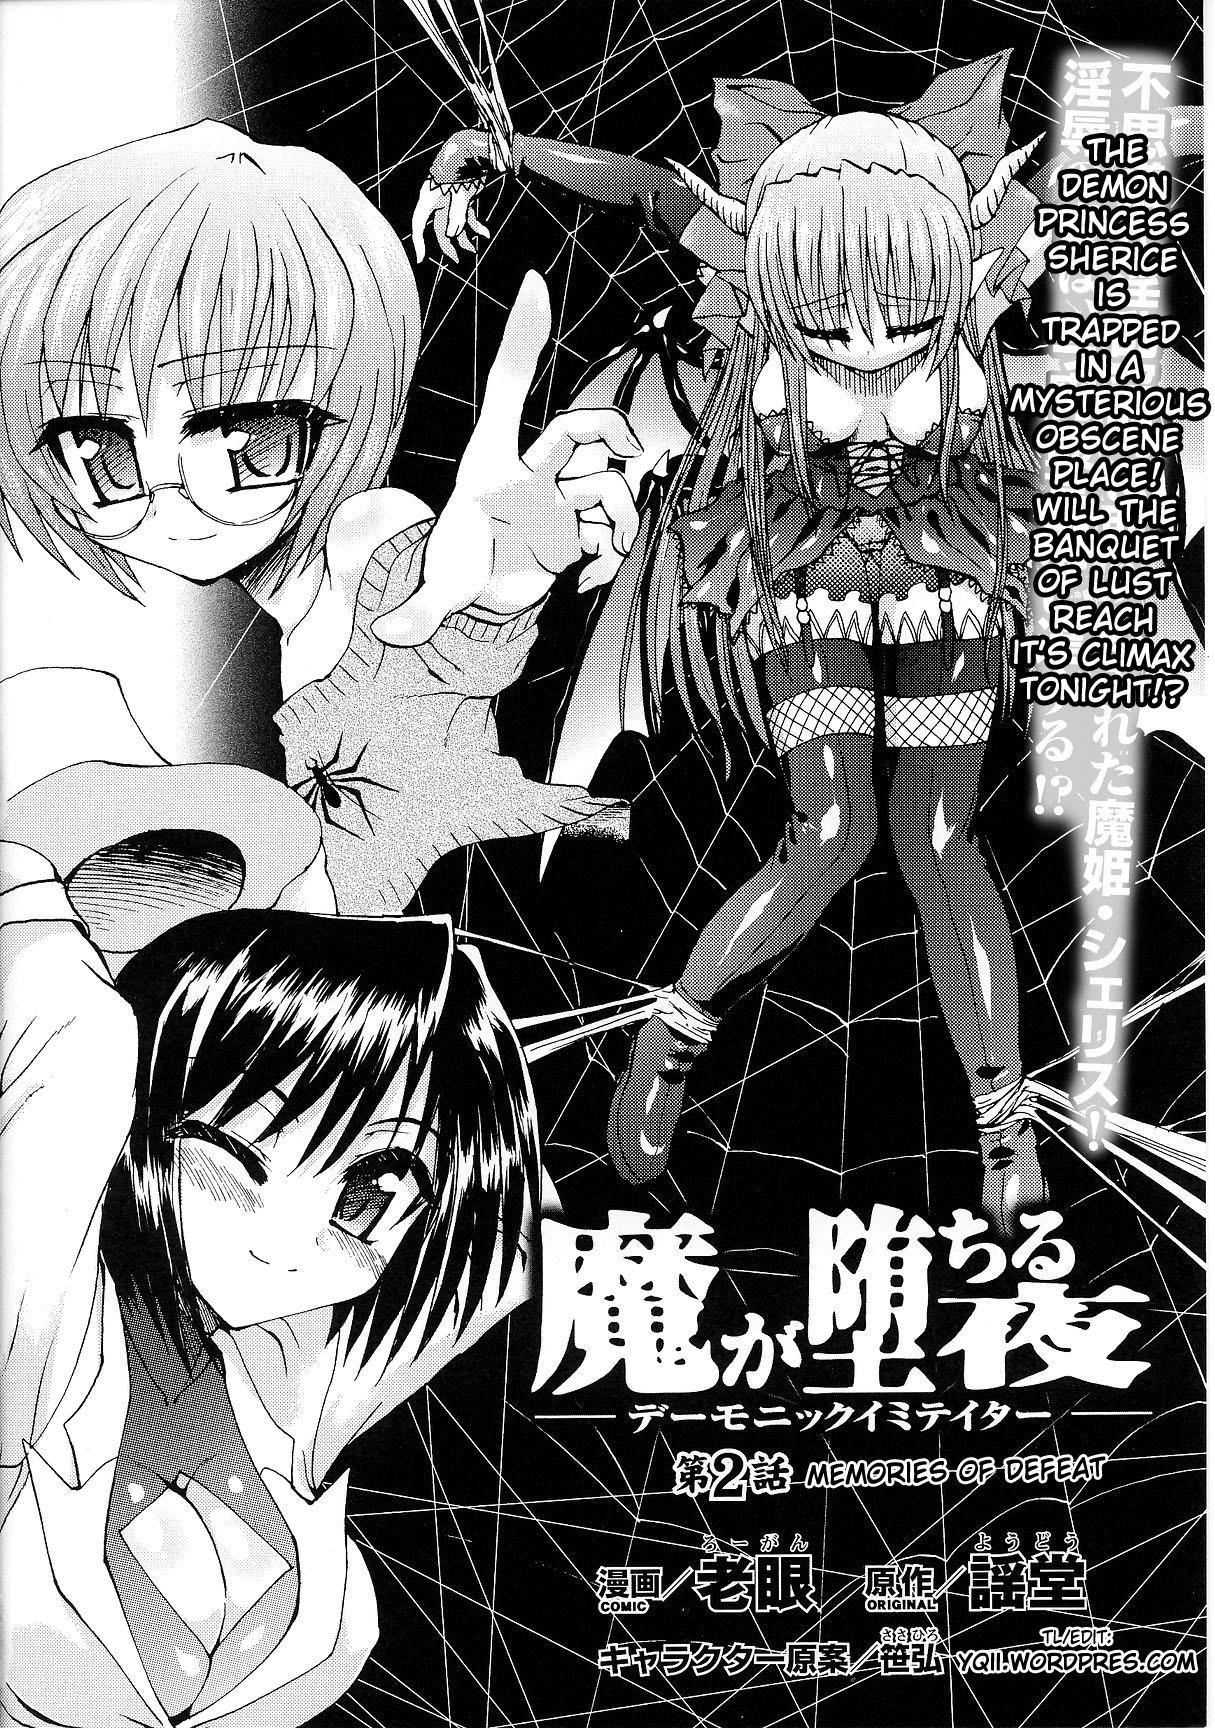 [Rougan] Ma ga Ochiru Yoru (The Night When Evil Falls) - Demonic Imitator Ch. 01-05 [ENG] 25